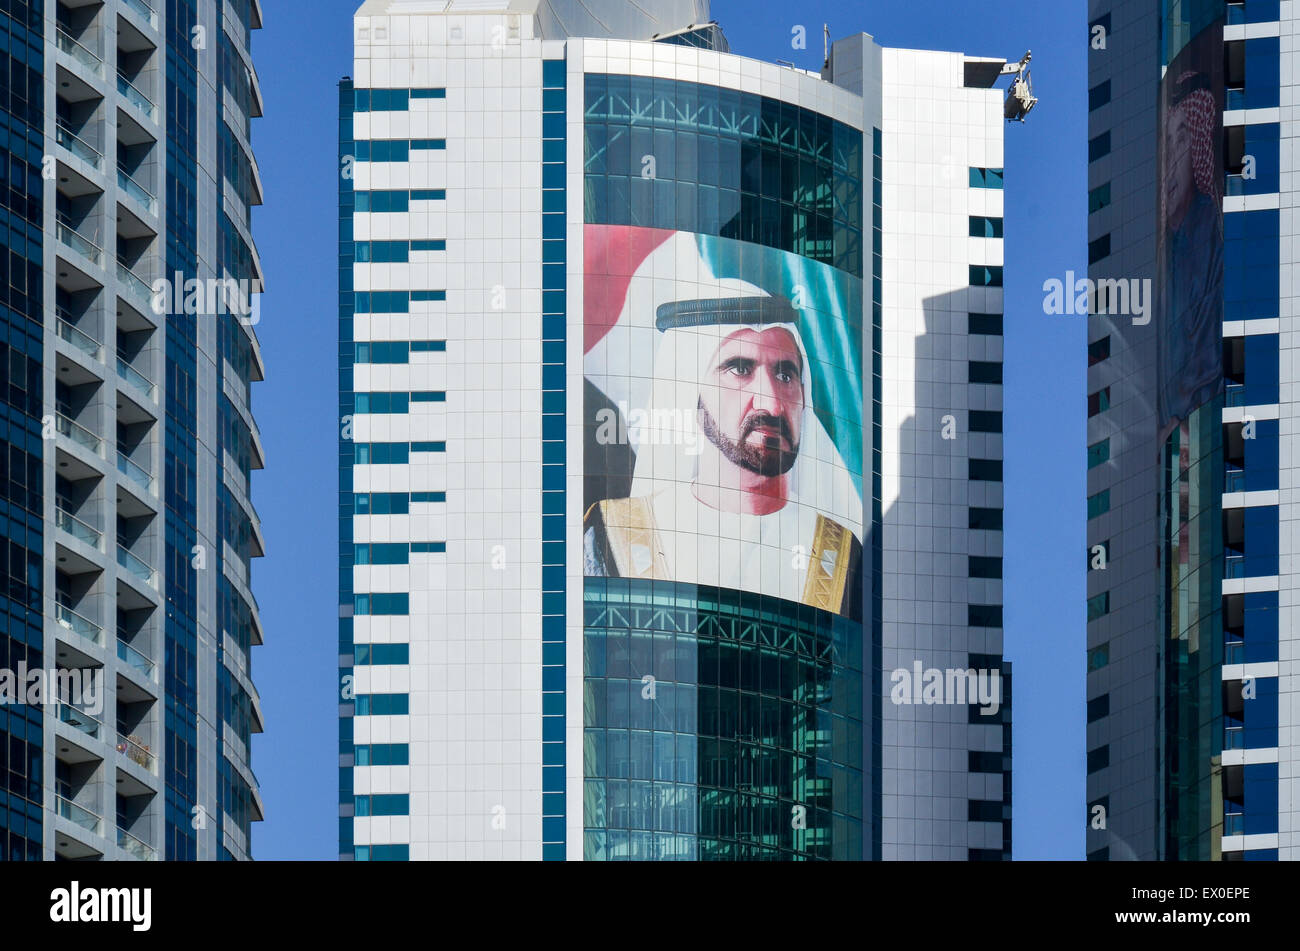 Portrait of Mohammed bin Rashid Al Maktoum on the towers of Dubai Marina - Stock Image